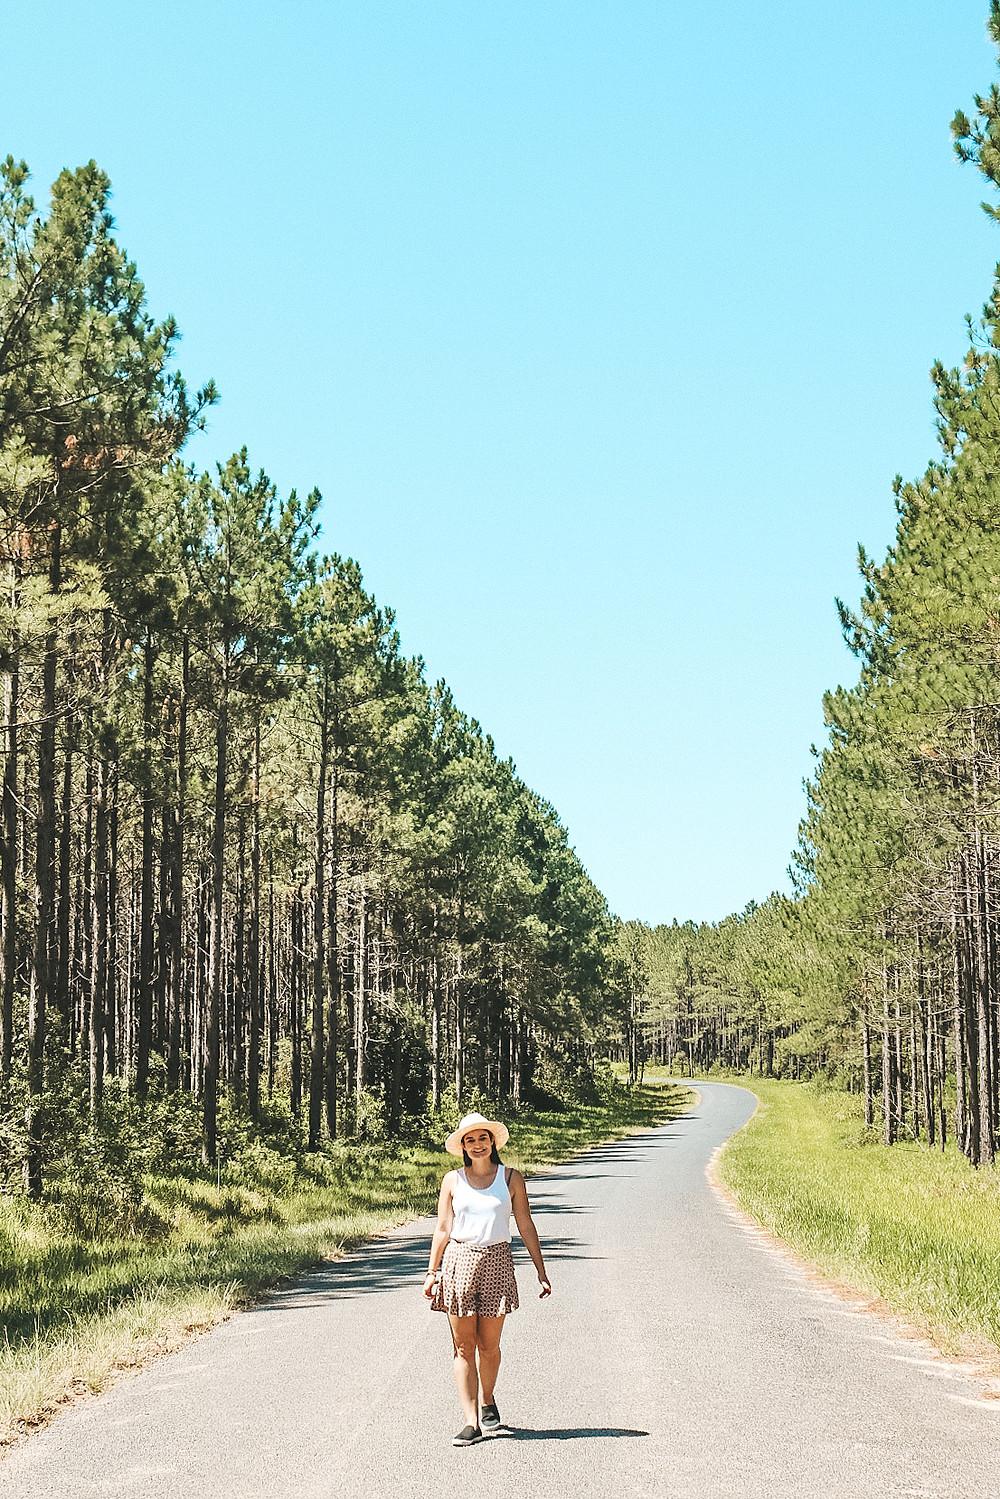 Pine Trees along Wild Horse Mountain Road Sunshine Coast